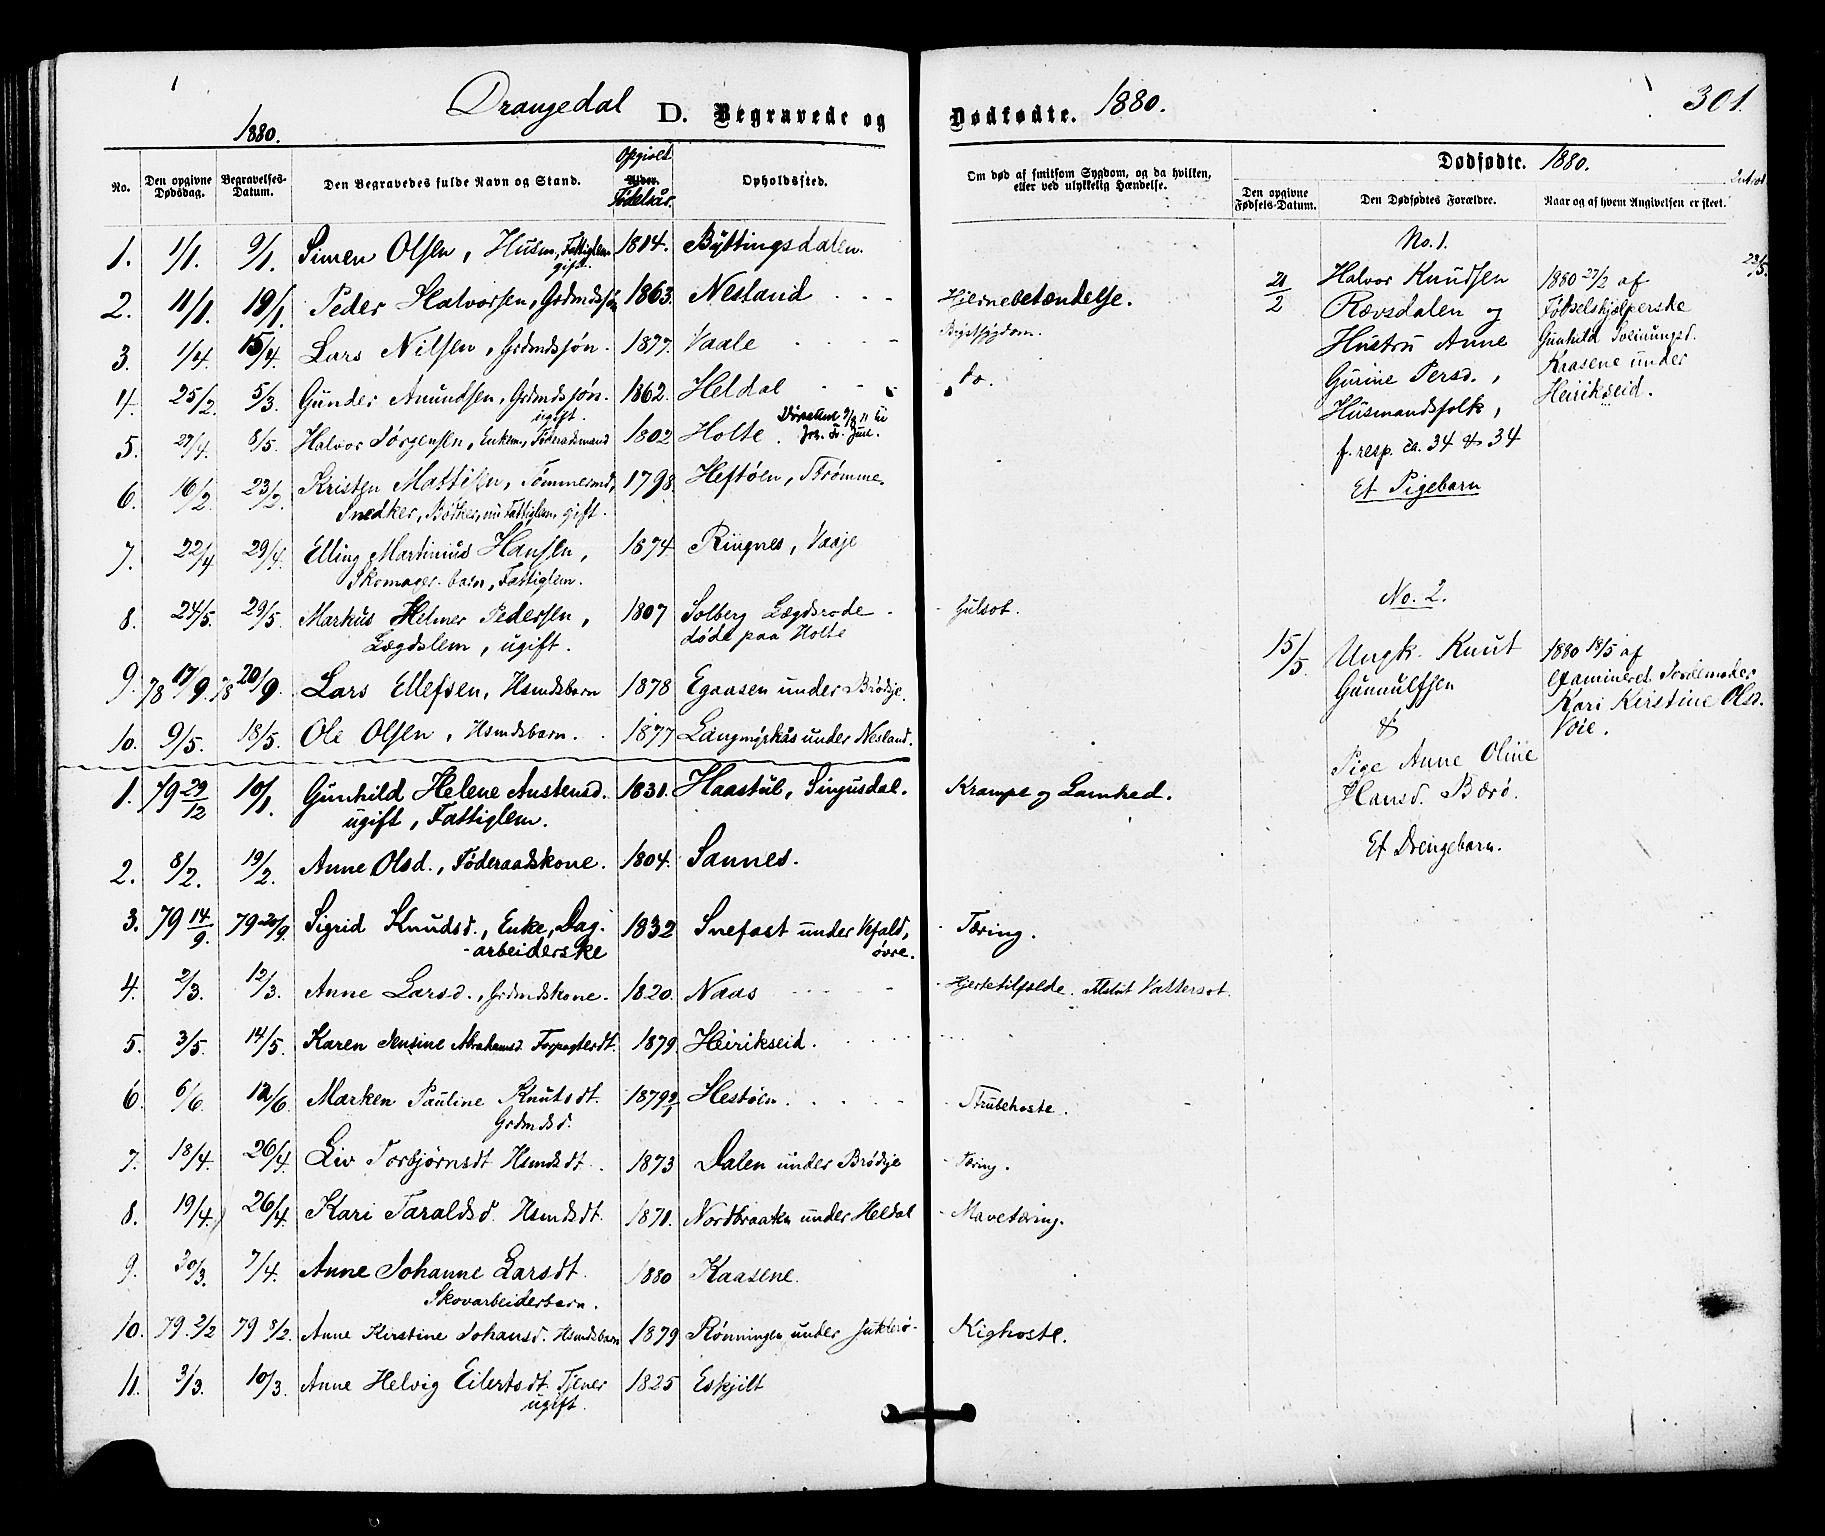 SAKO, Drangedal kirkebøker, F/Fa/L0009: Ministerialbok nr. 9 /1, 1872-1884, s. 301